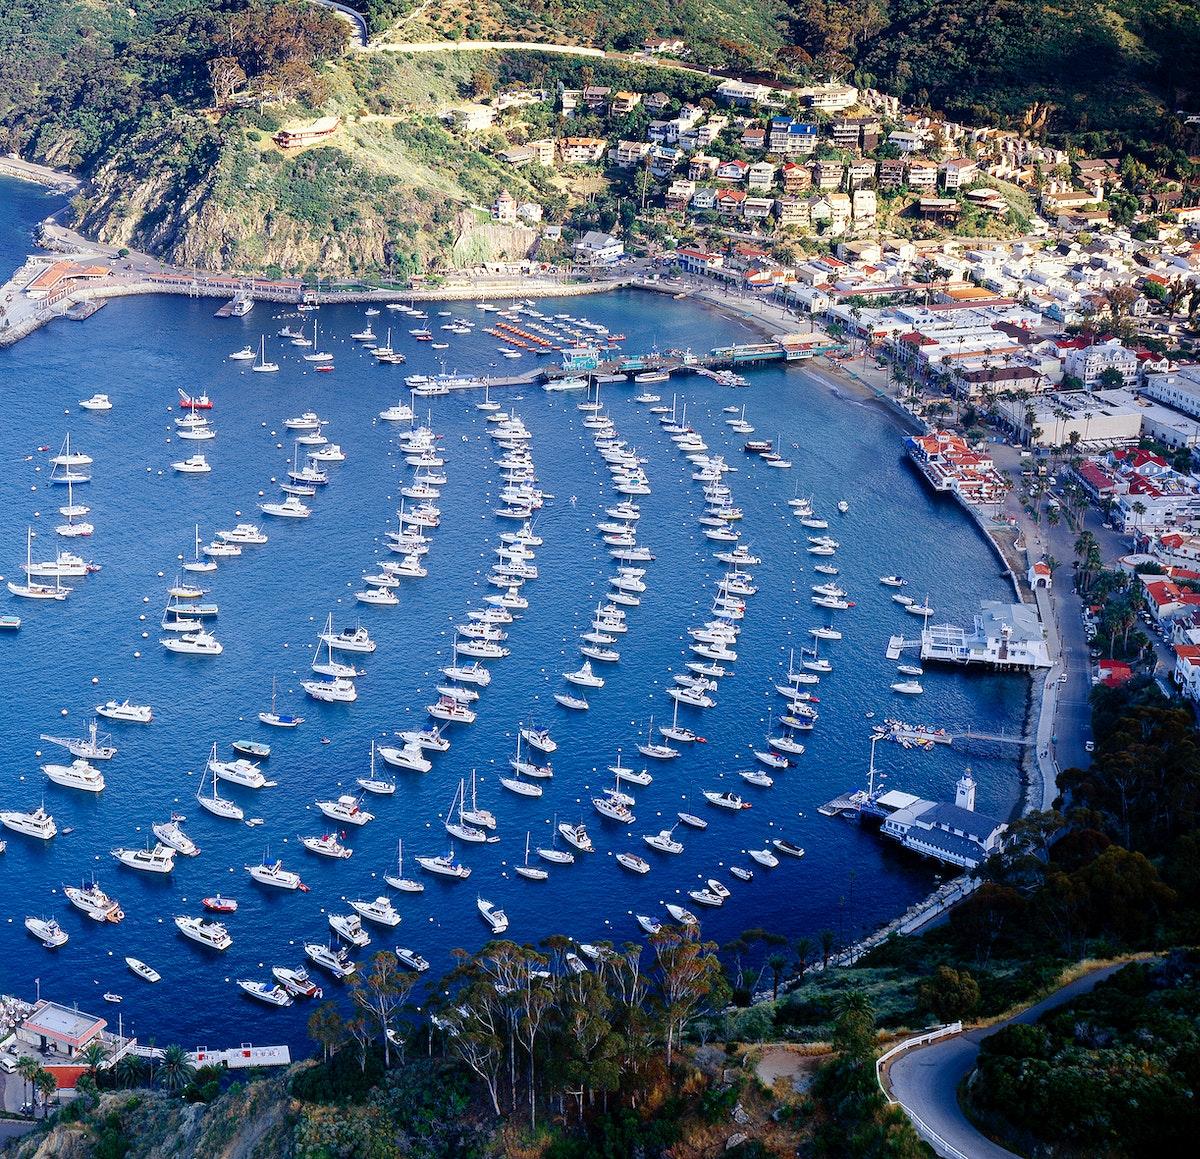 Santa Catalina Island, often called Catalina Island, or just Catalina, is a rocky island off the coast of the U.S. state of…